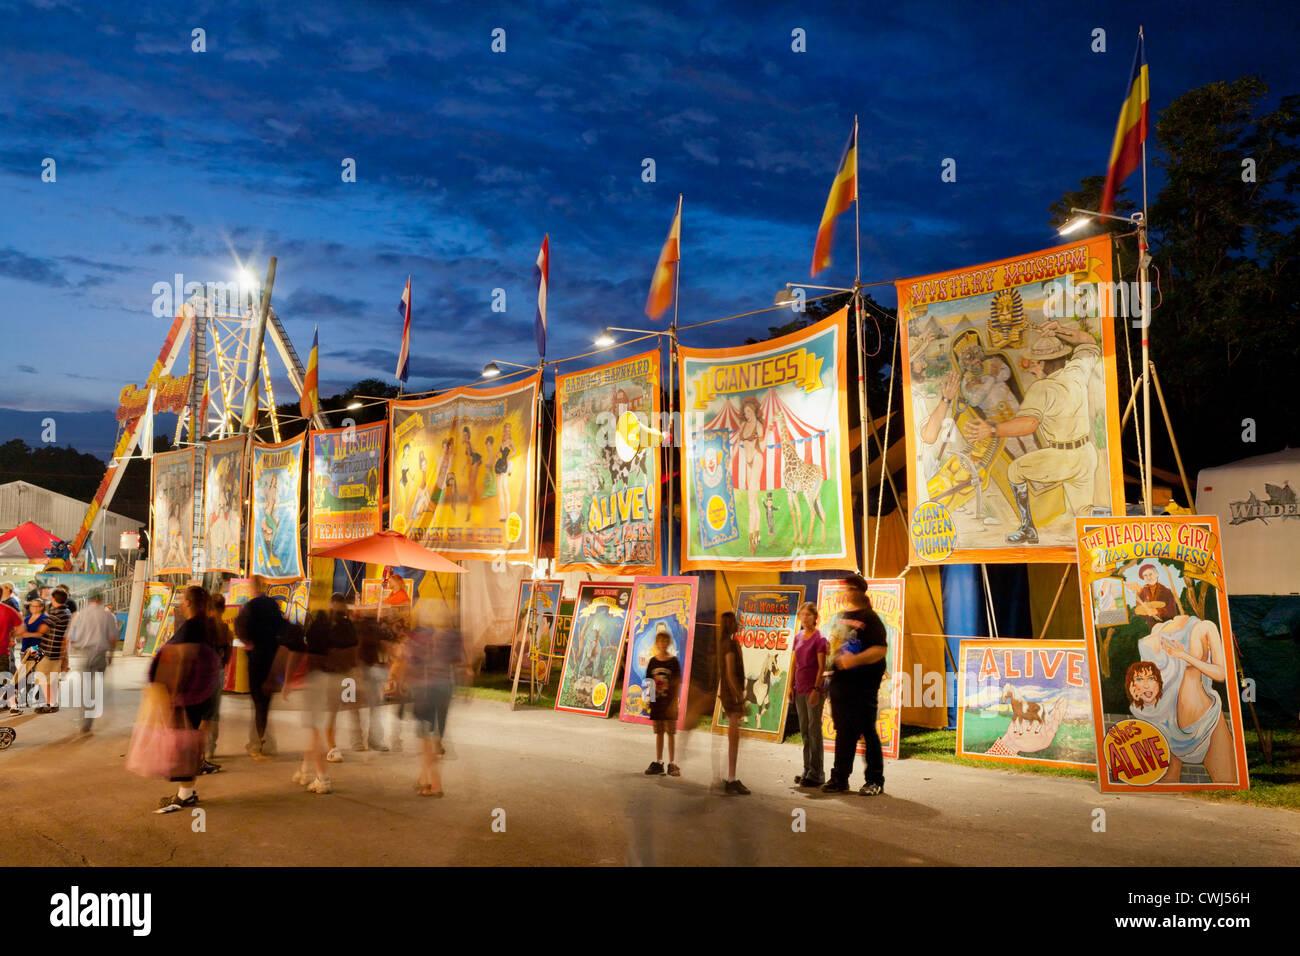 New york montgomery county fonda - Freak Show Fonda Fair Montgomery County Central New York State